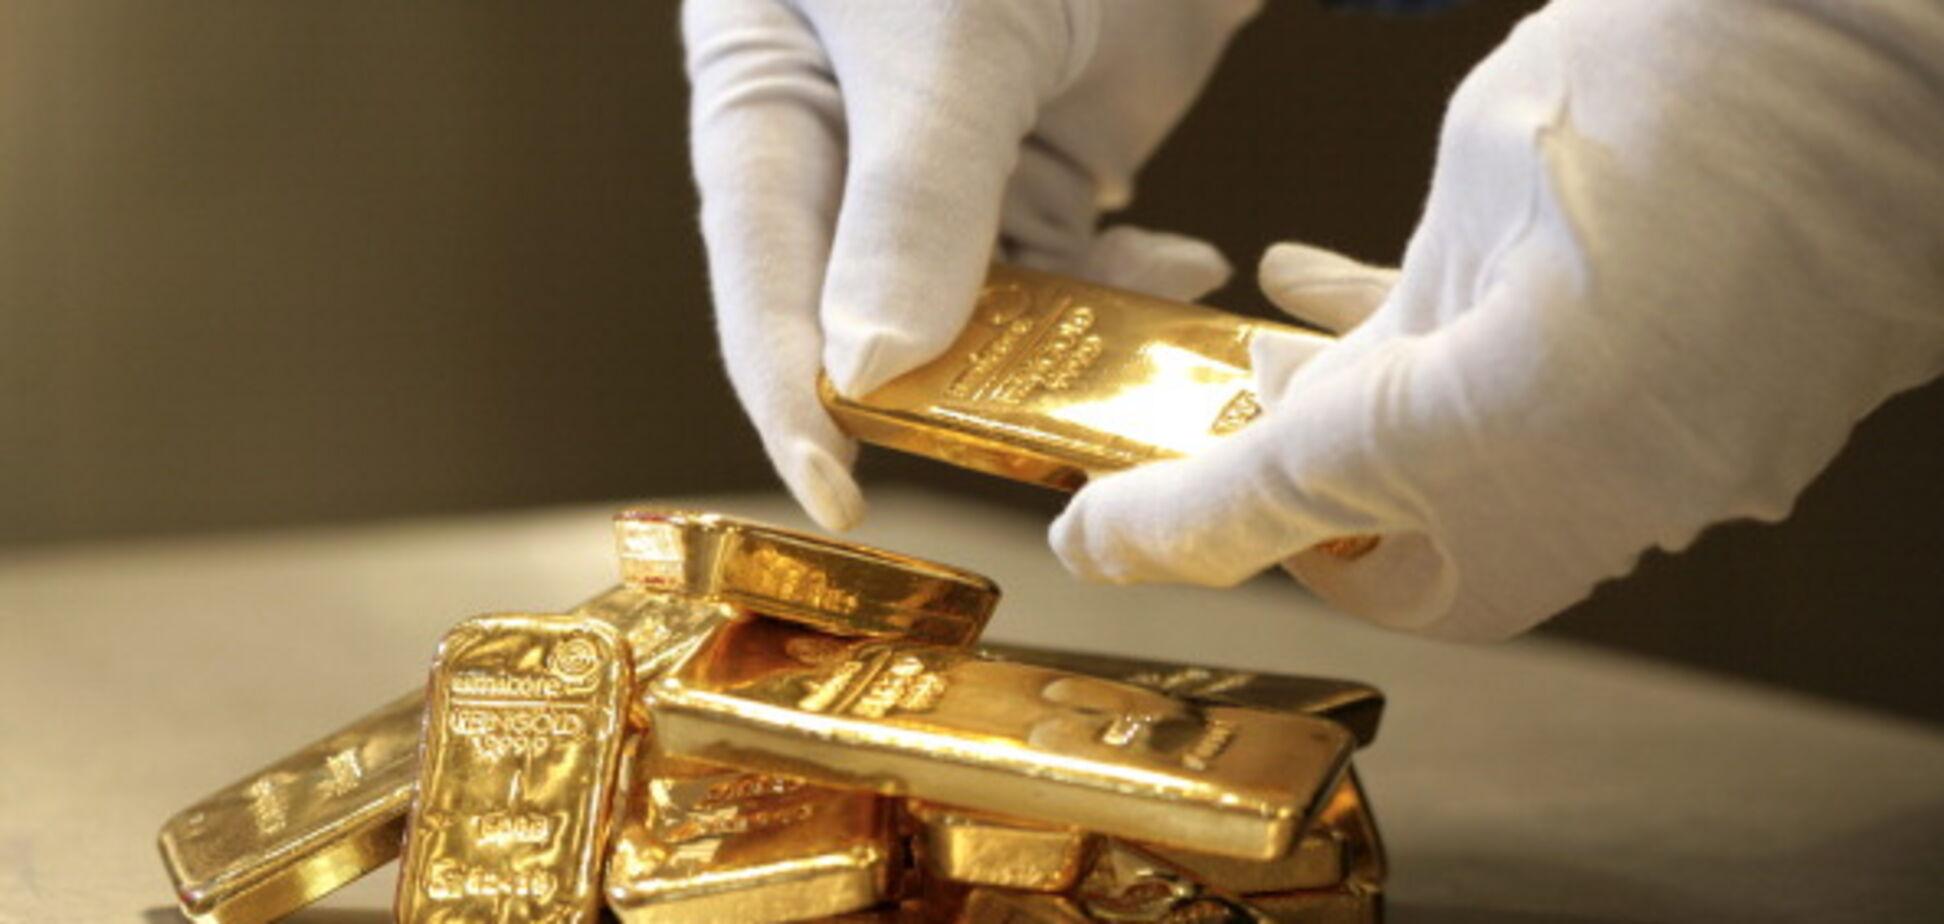 Судьба полтонны золота 'семьи Януковича' из банка Швейцарии: ГПУ прояснила ажиотаж